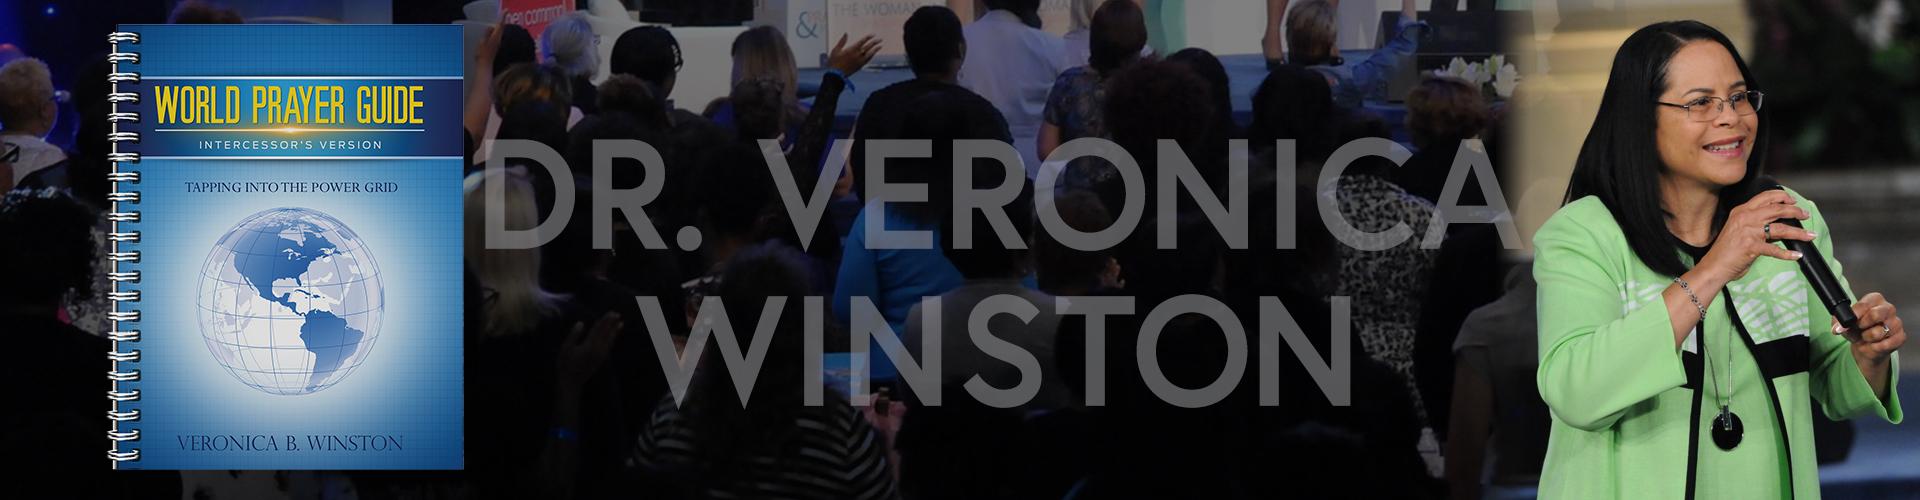 Dr. Veronica Winston